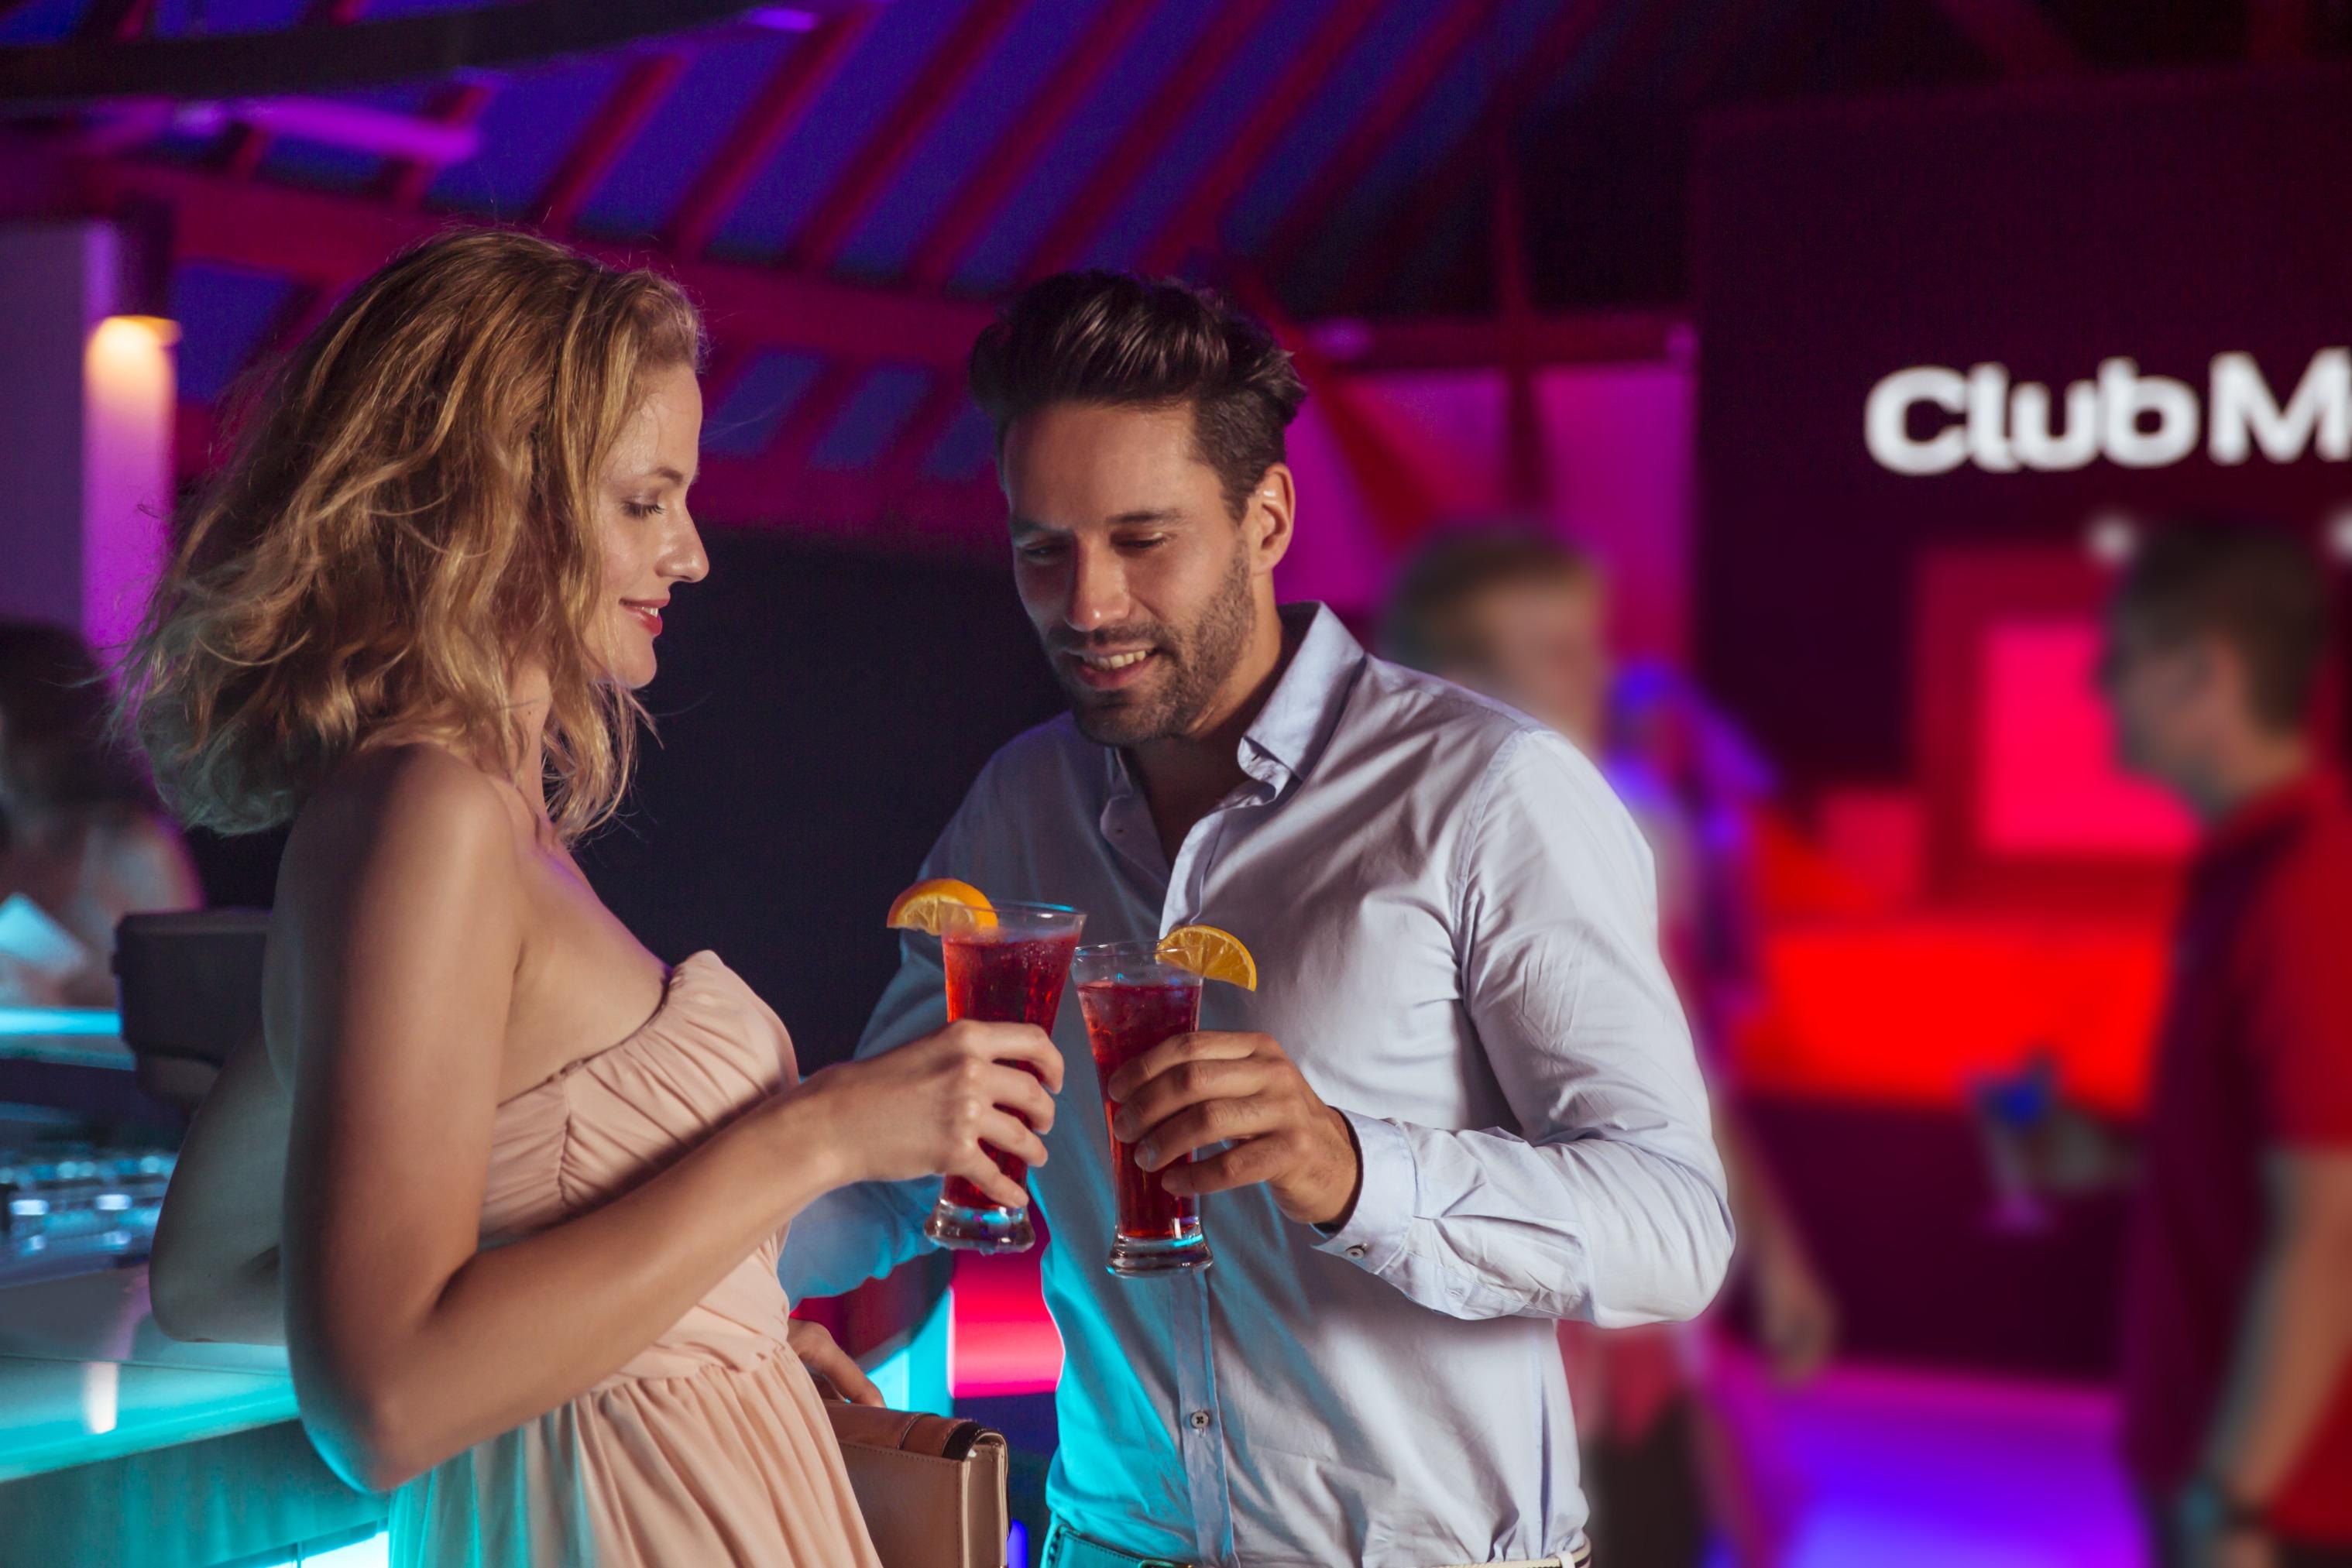 local Dating Club commentaires en ligne Lisdoonvarna Matchmaking